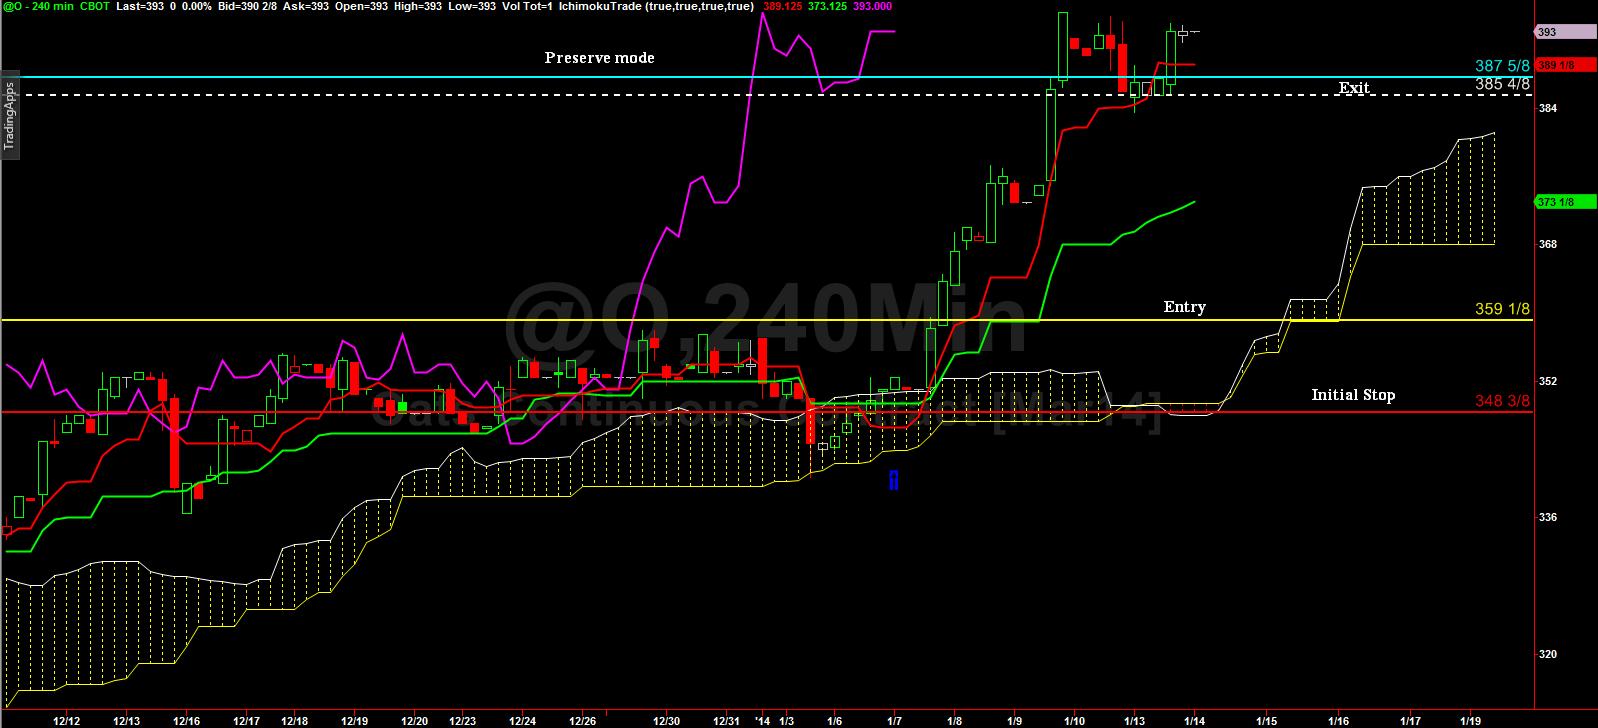 Weekly_future_jan10_2014_chart